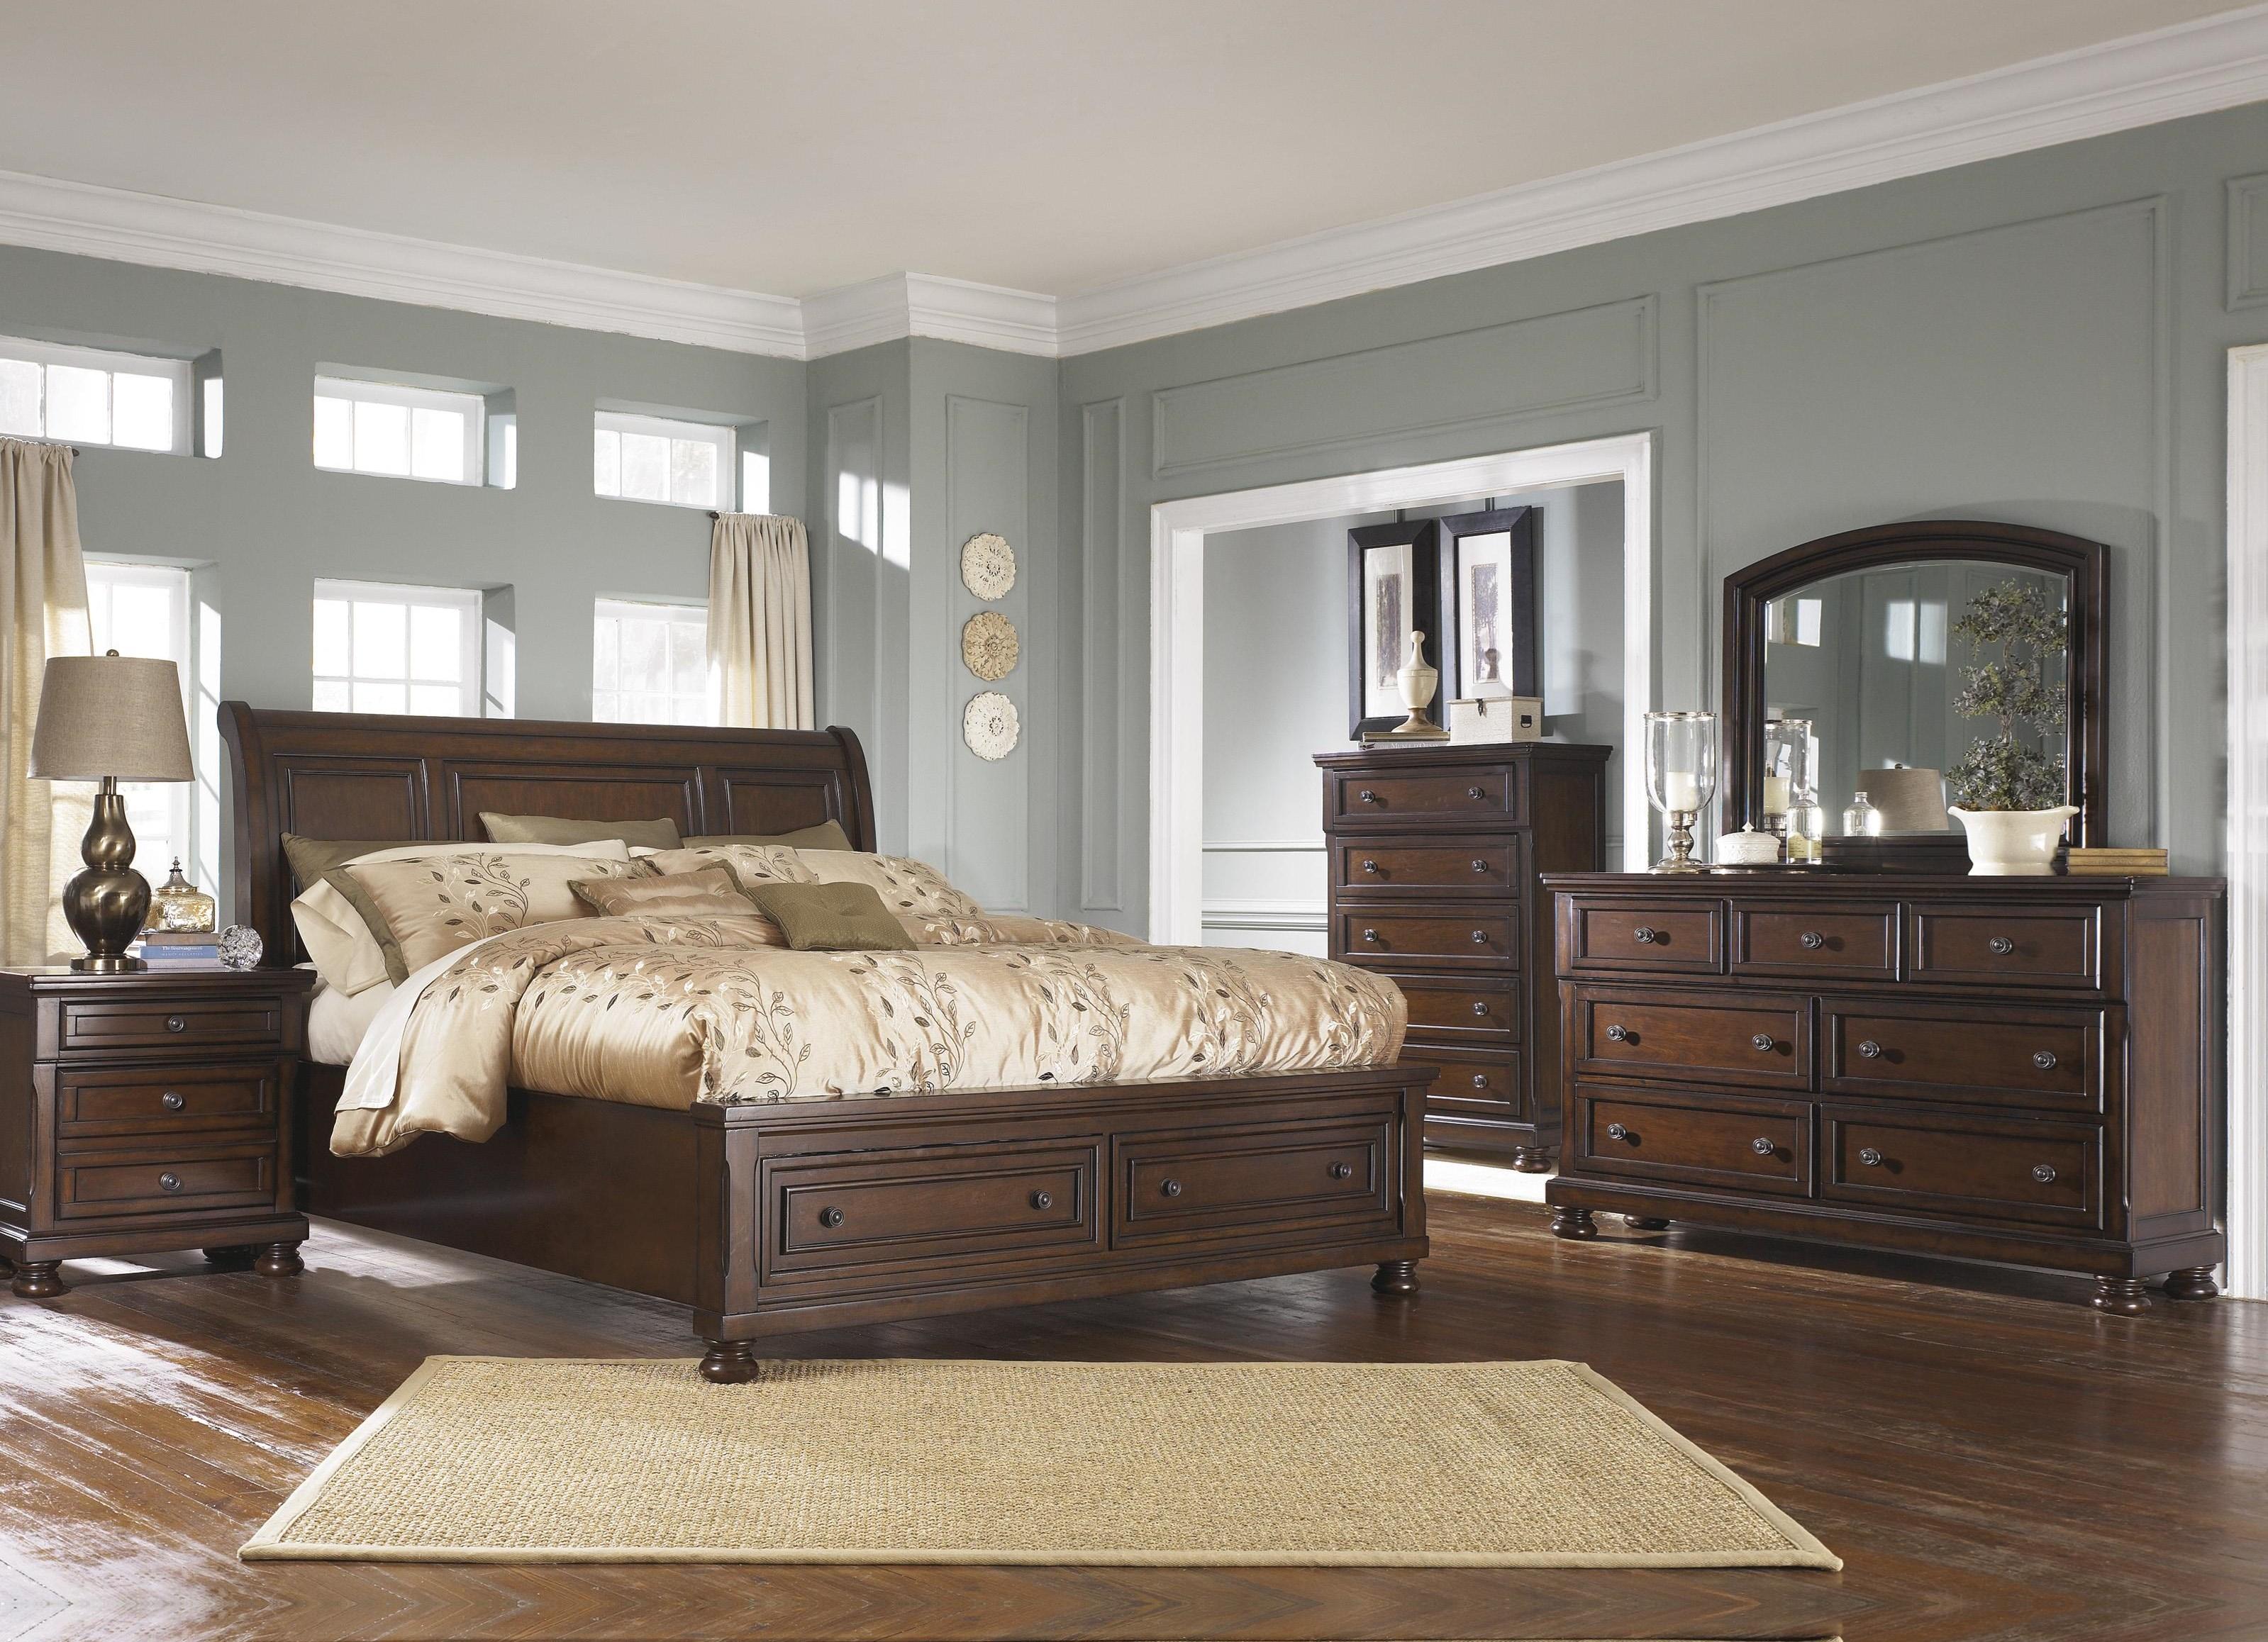 Porter 7 Piece Queen Bedroom Set by Ashley Furniture at Sam Levitz Furniture